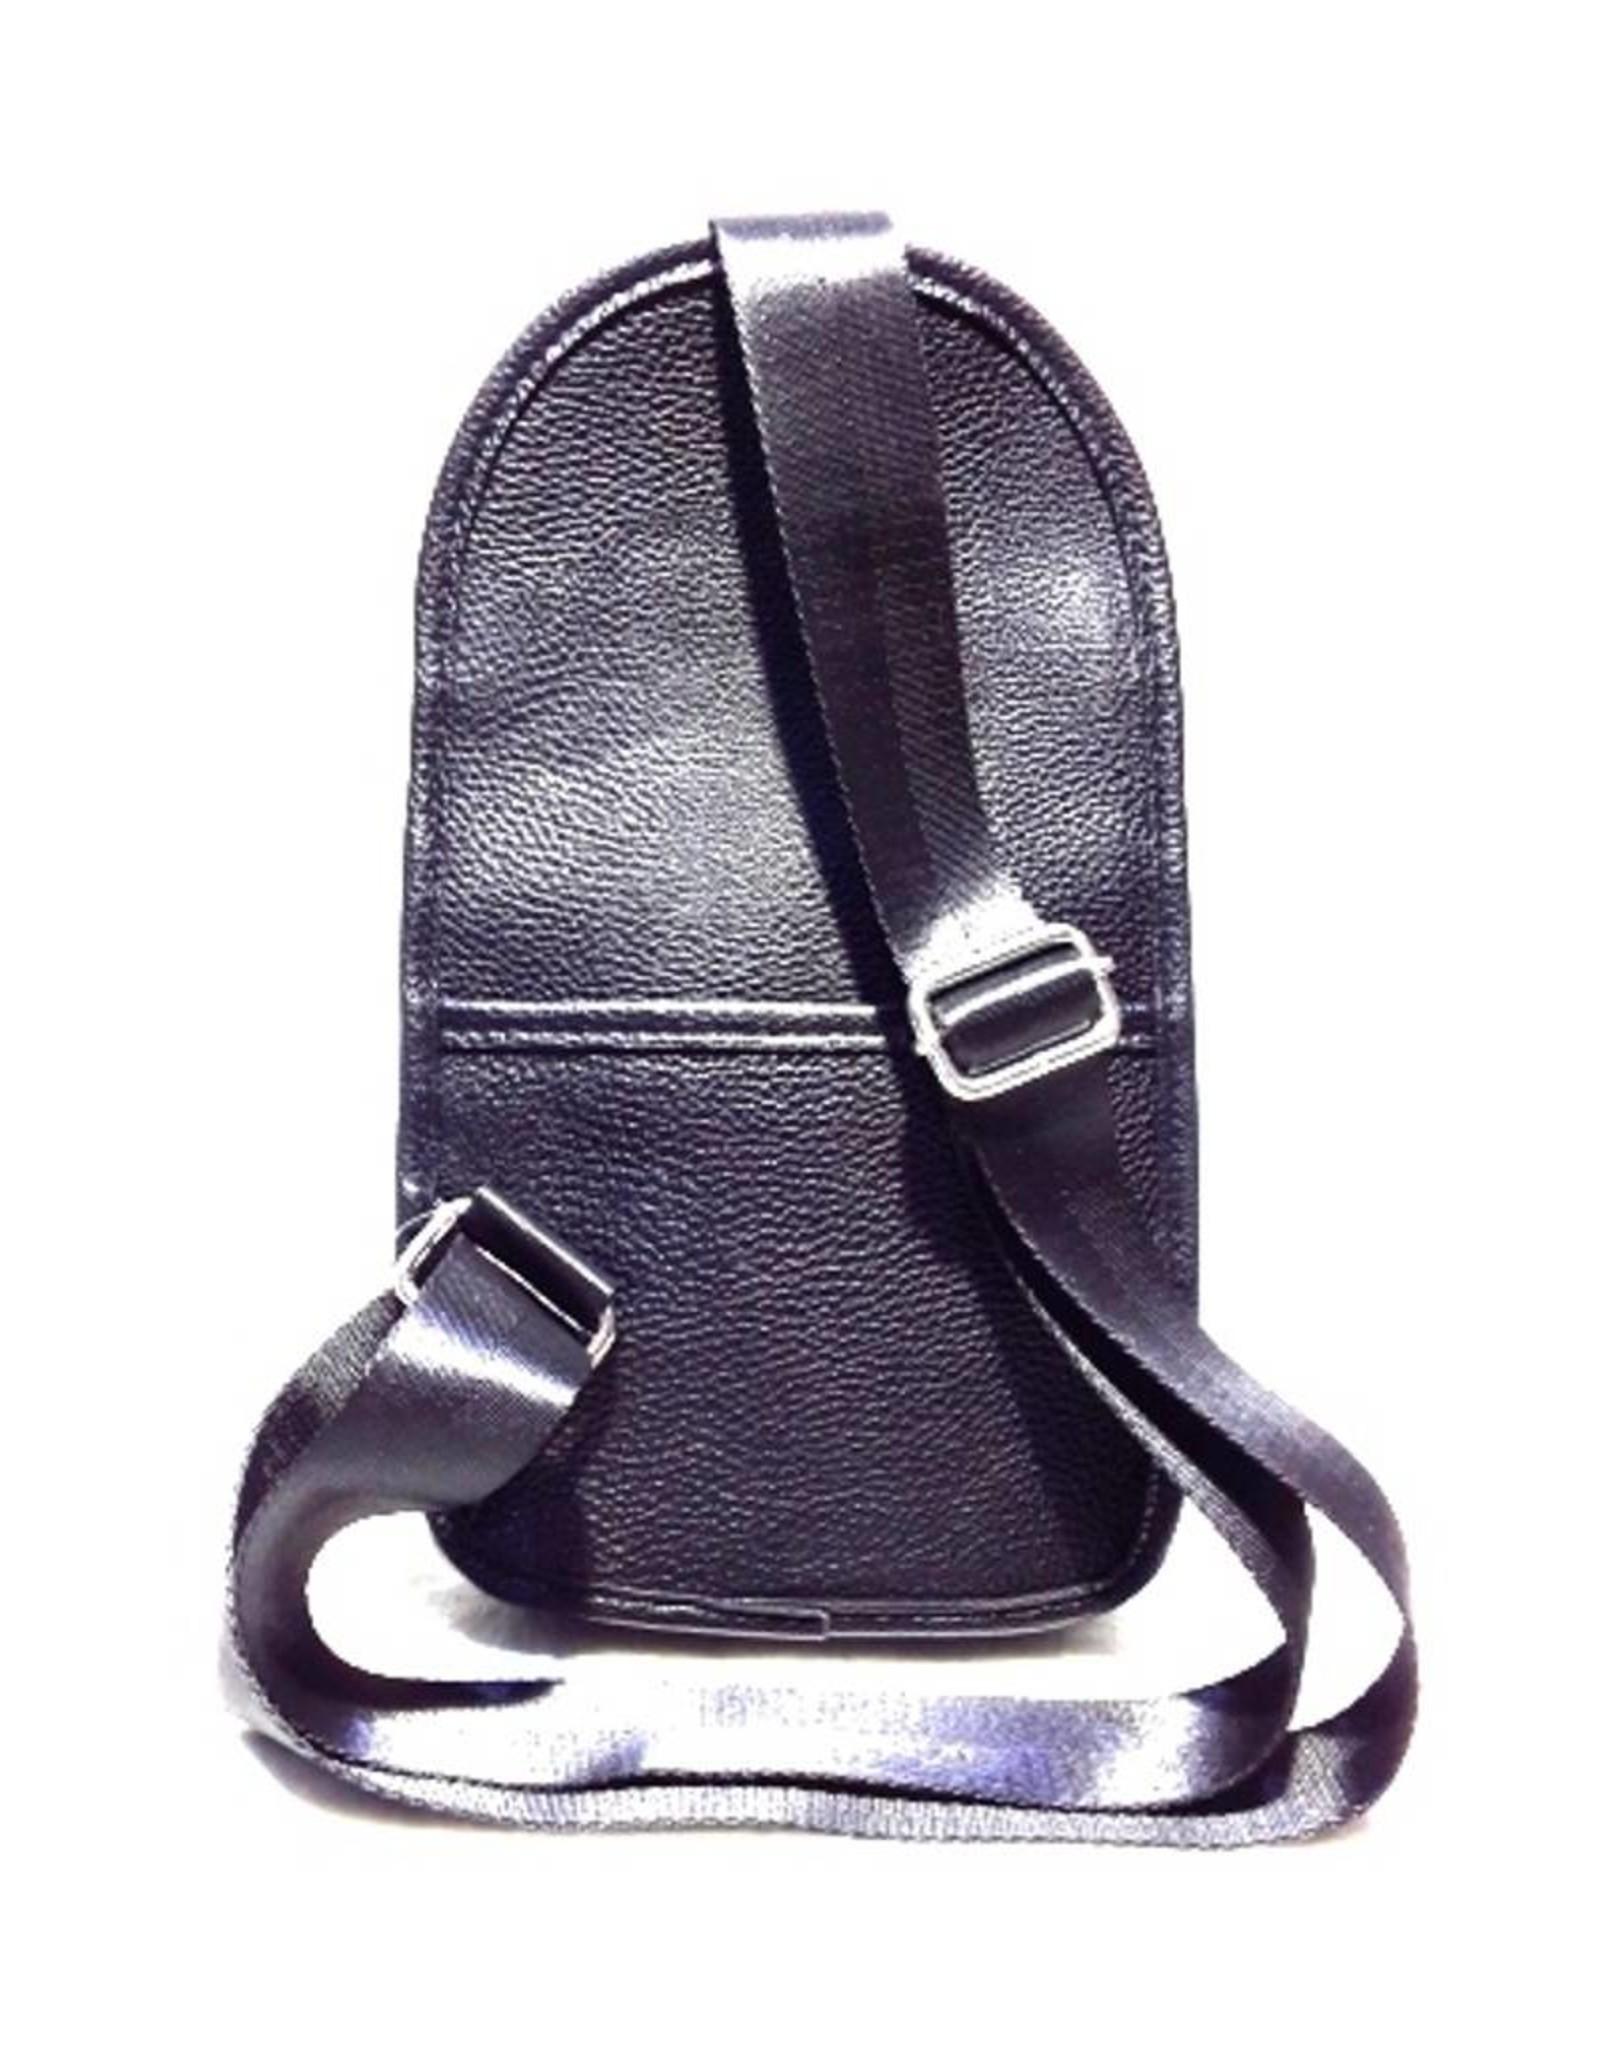 Dark Desire Gothic bags Steampunk bags -Gothic Bag Crossbody Dark Desire 3080